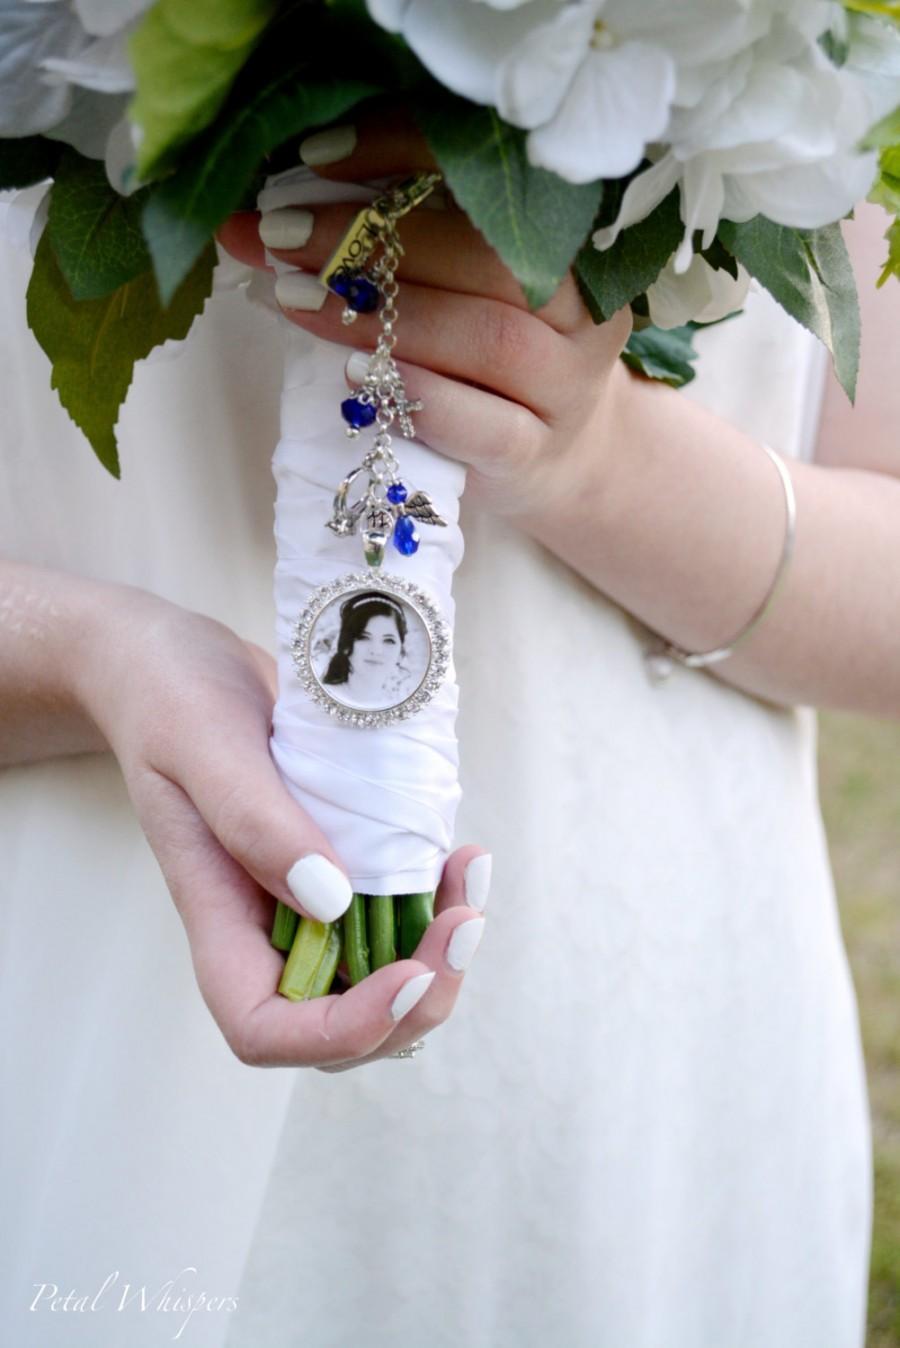 Свадьба - Something Blue Bouquet Charm, Wedding Memorial Charm, Bridal Bouquet Charm, Gift For Brides, Bridal Accessories, Wedding Bouquet Charm